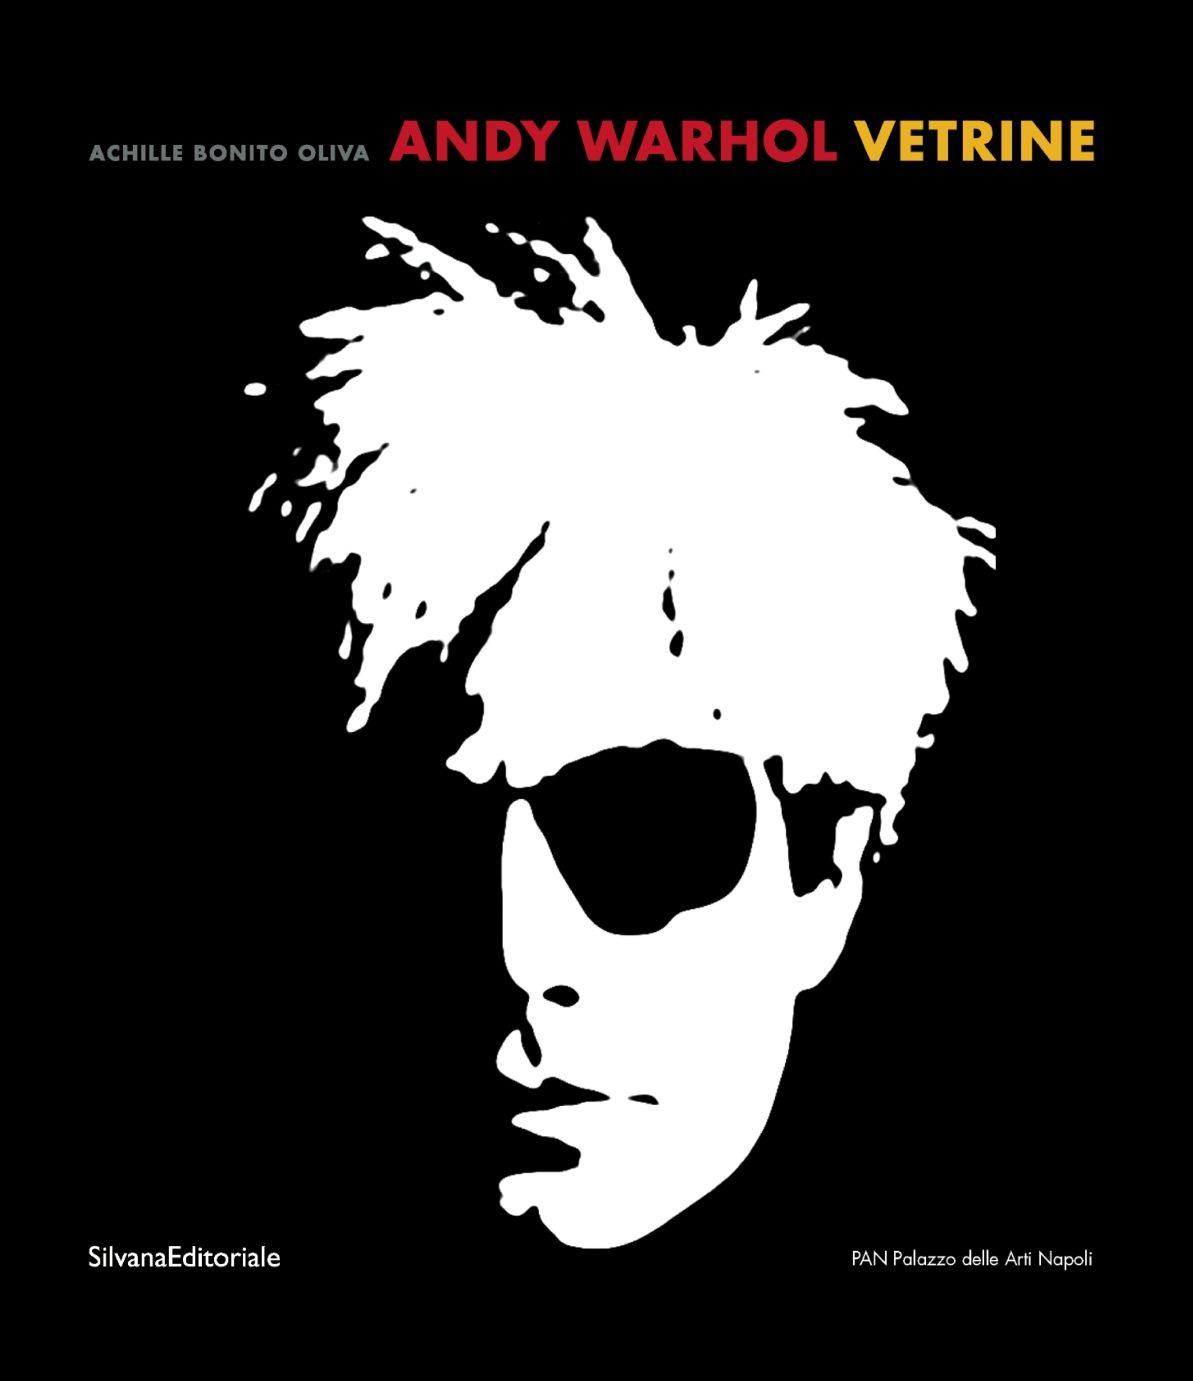 Andy Warhol Vetrine